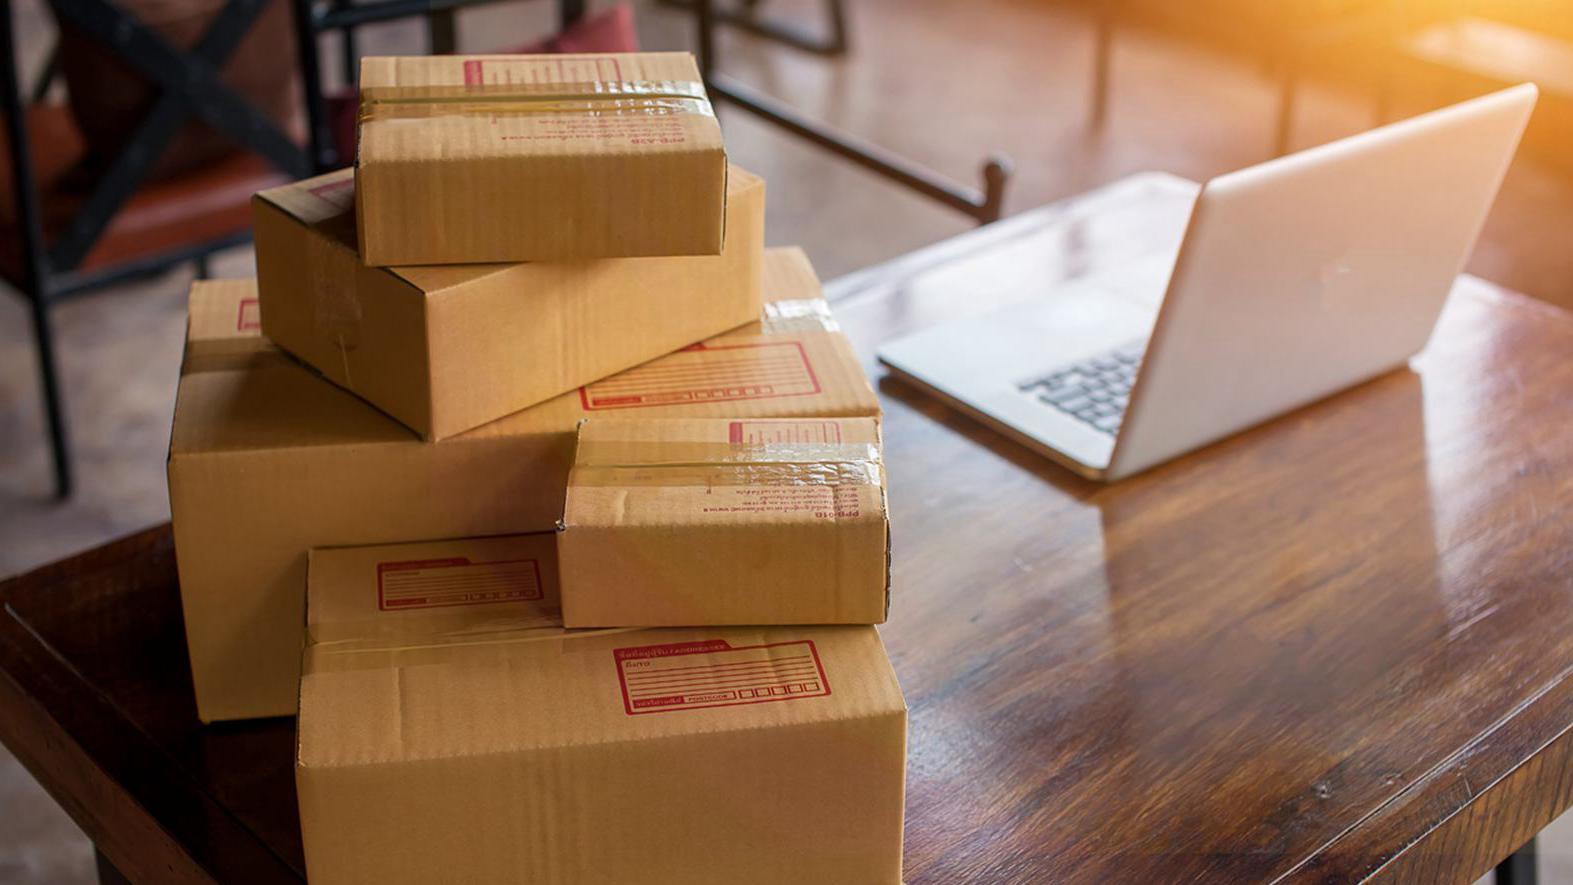 Cross-border e-commerce boosts trade in China-Vietnam border county